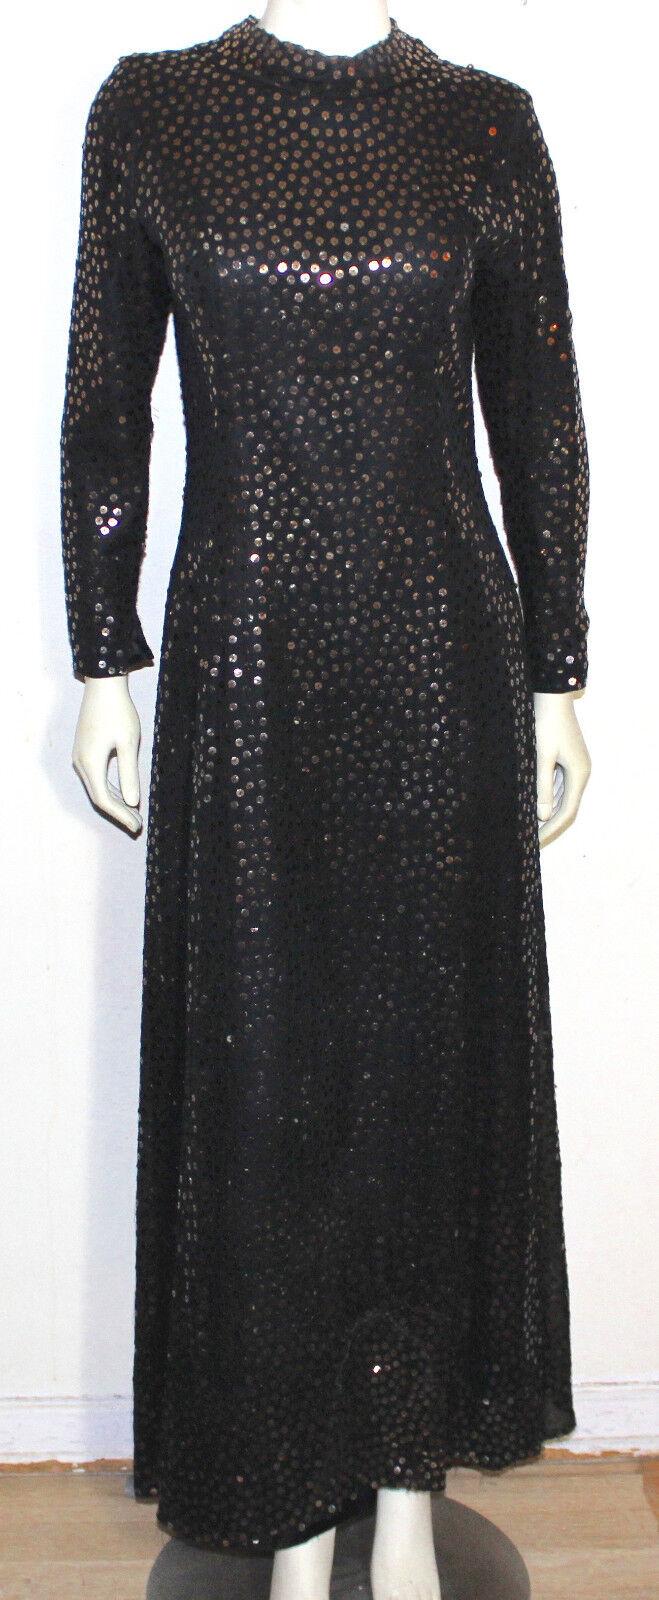 Vintage bronze sequin evening gown dress